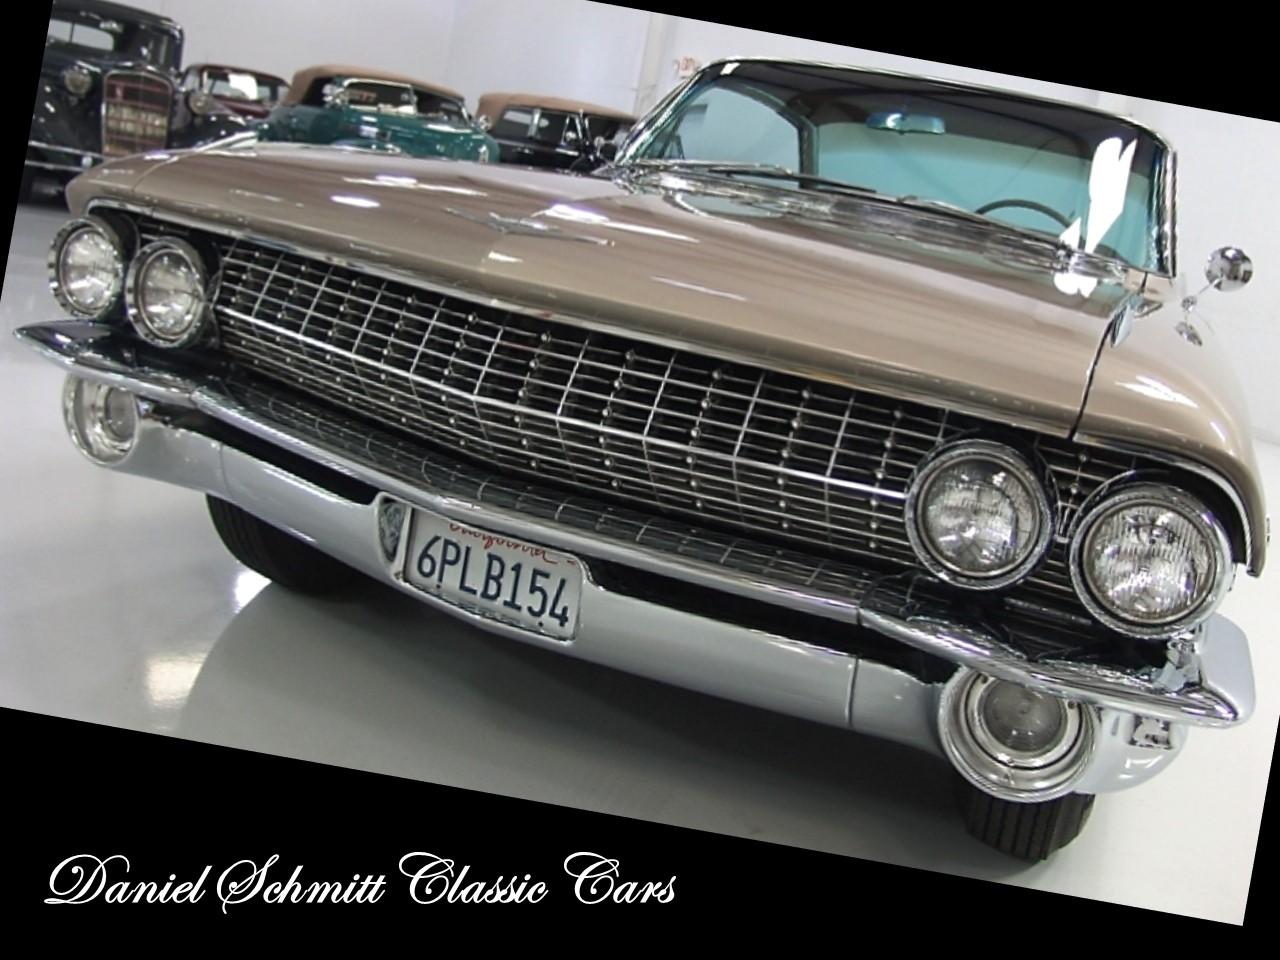 1961 Cadillac Series 6300 Coupe Deville Notoriousluxury Sedan 10